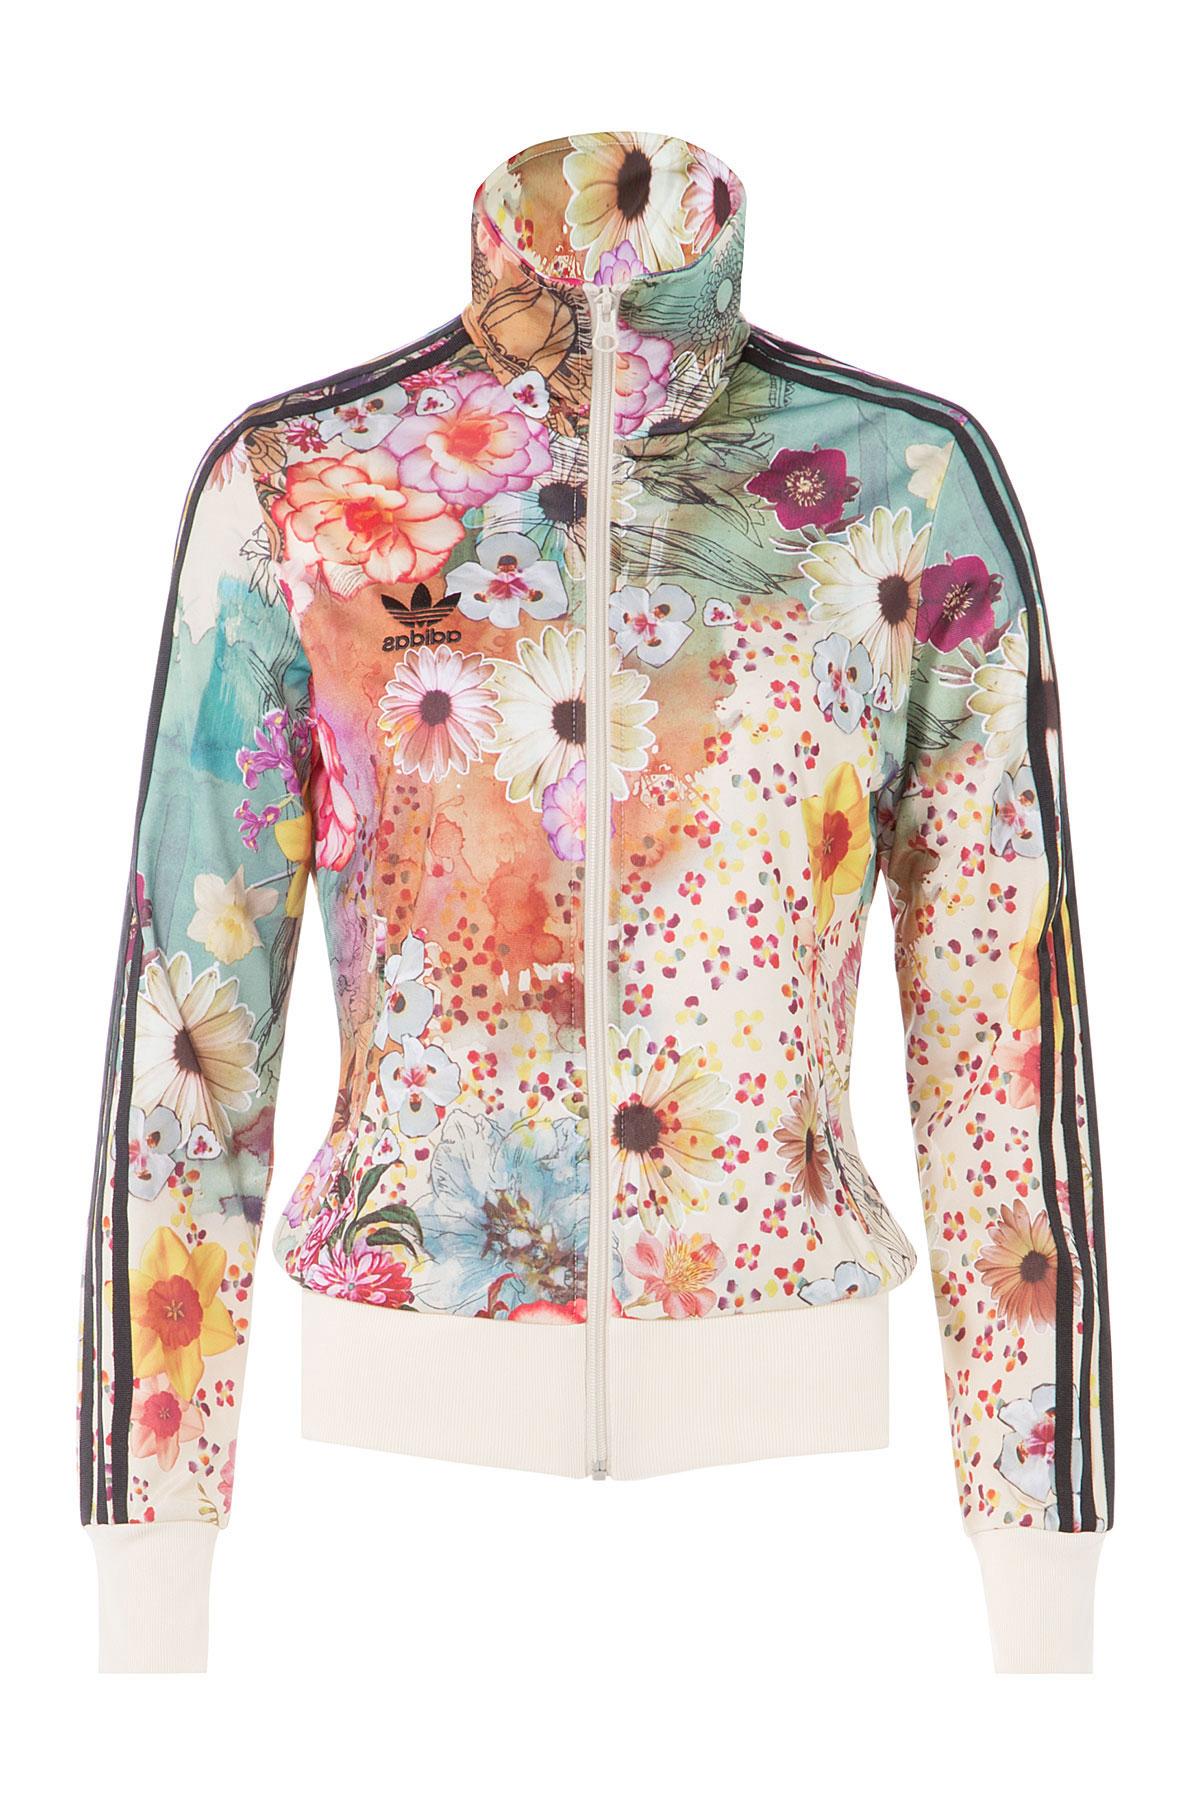 Adidas Originals Floral Print Zip Front Jacket